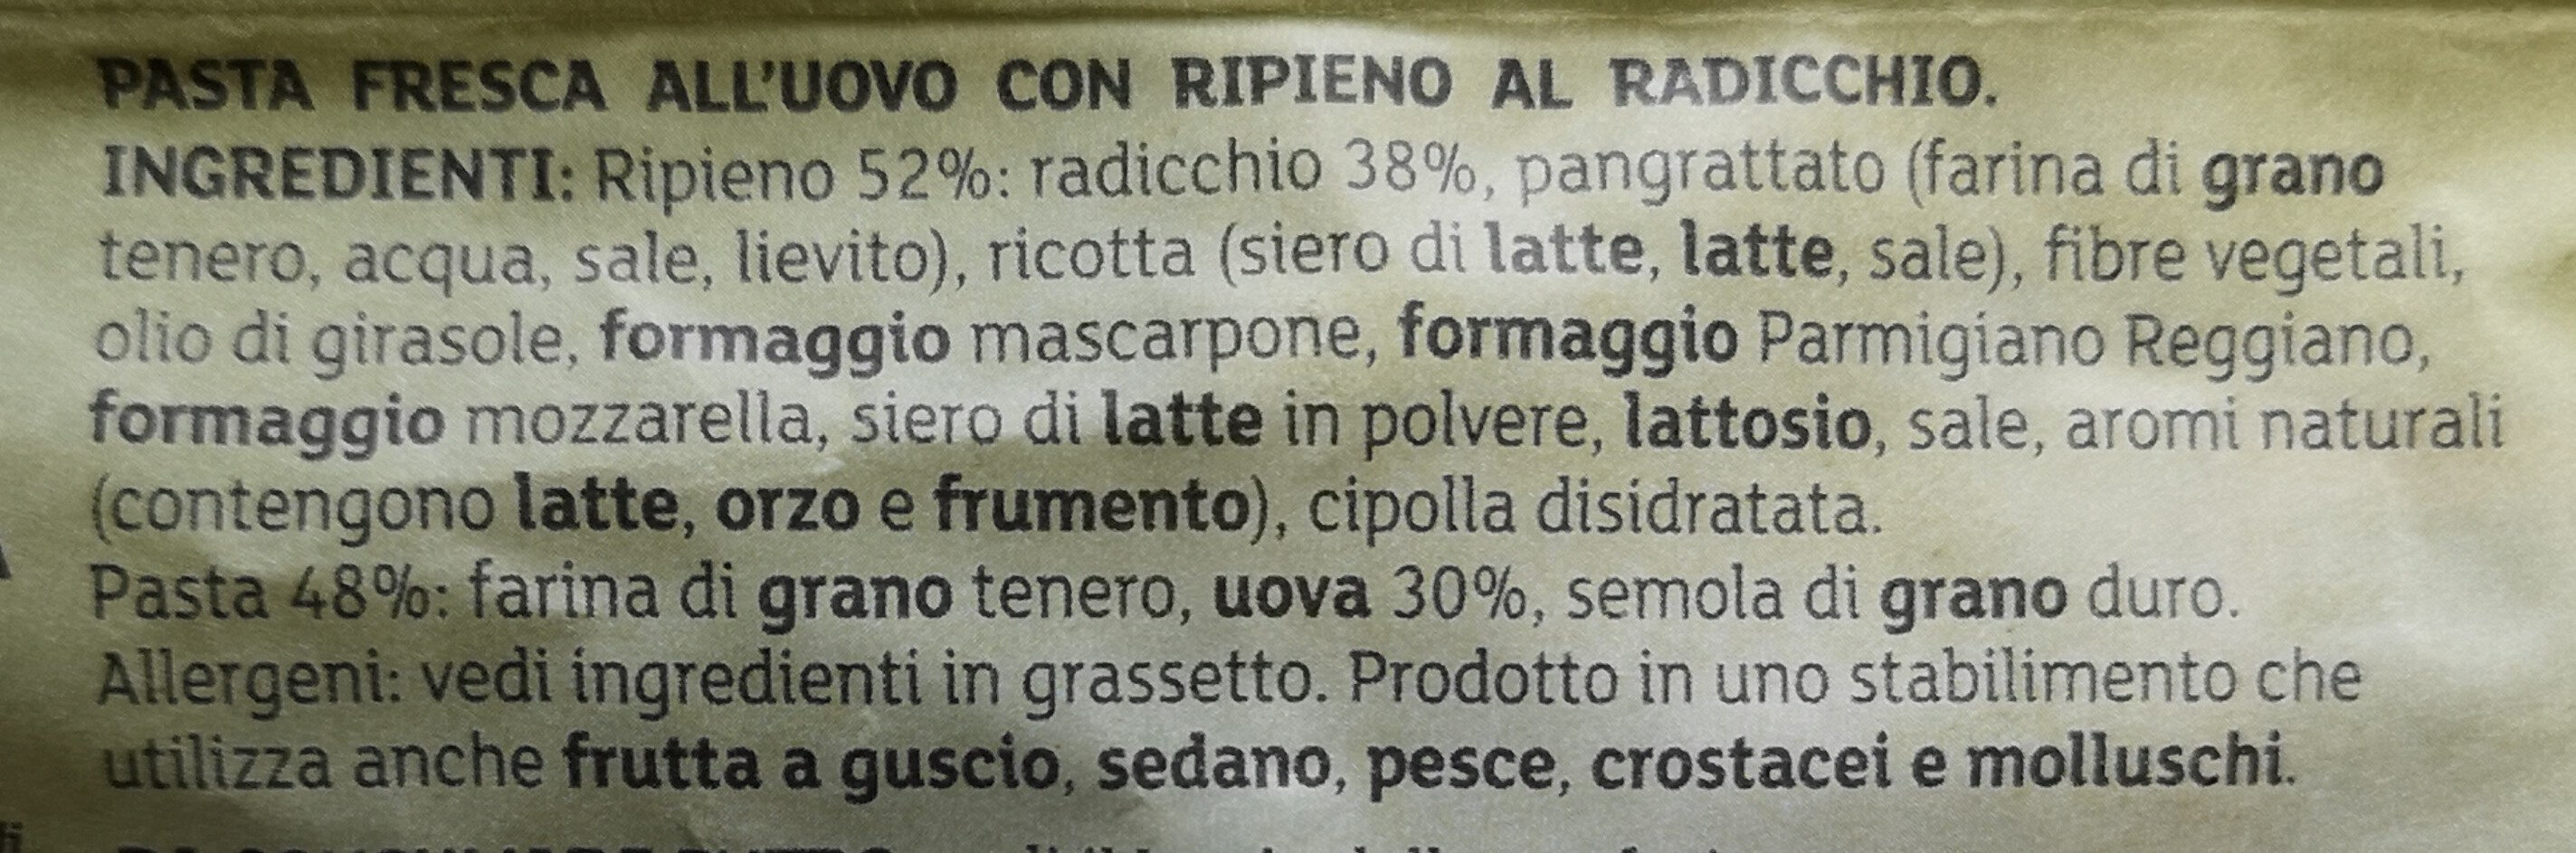 Gioia Verde Radicchio - Ingredients - it